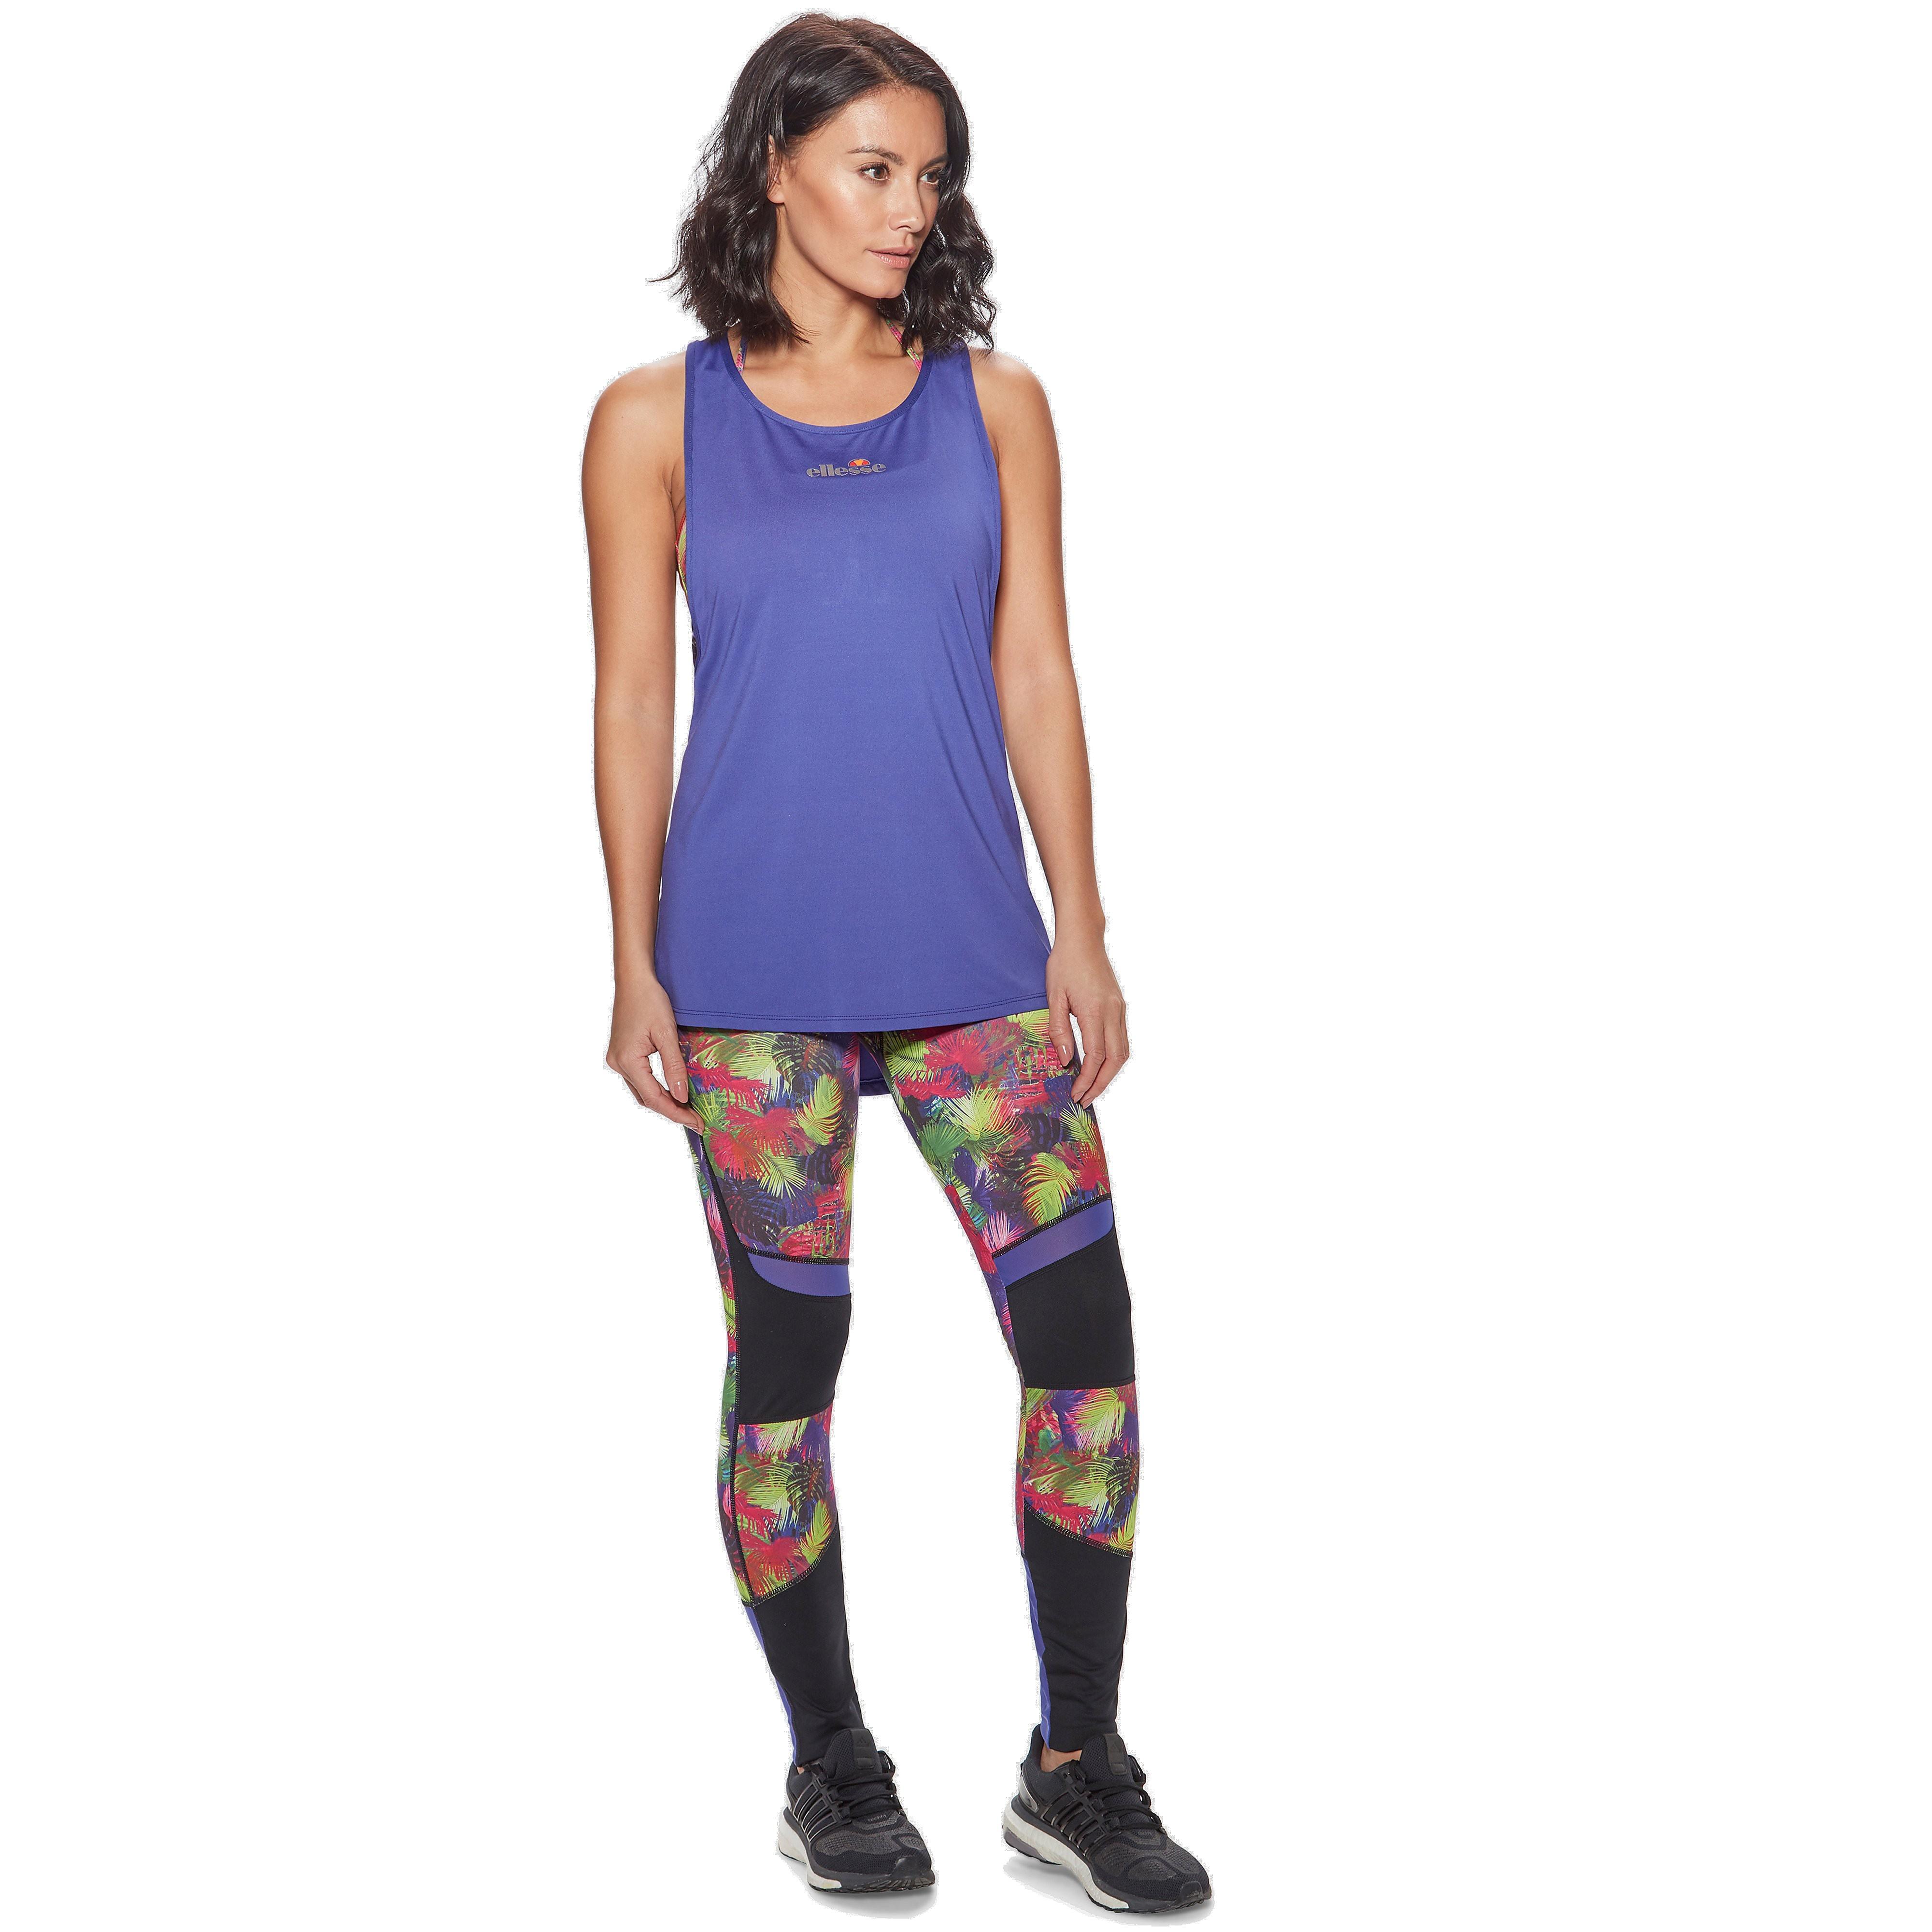 Ellesse Athena Women's Training Leggings